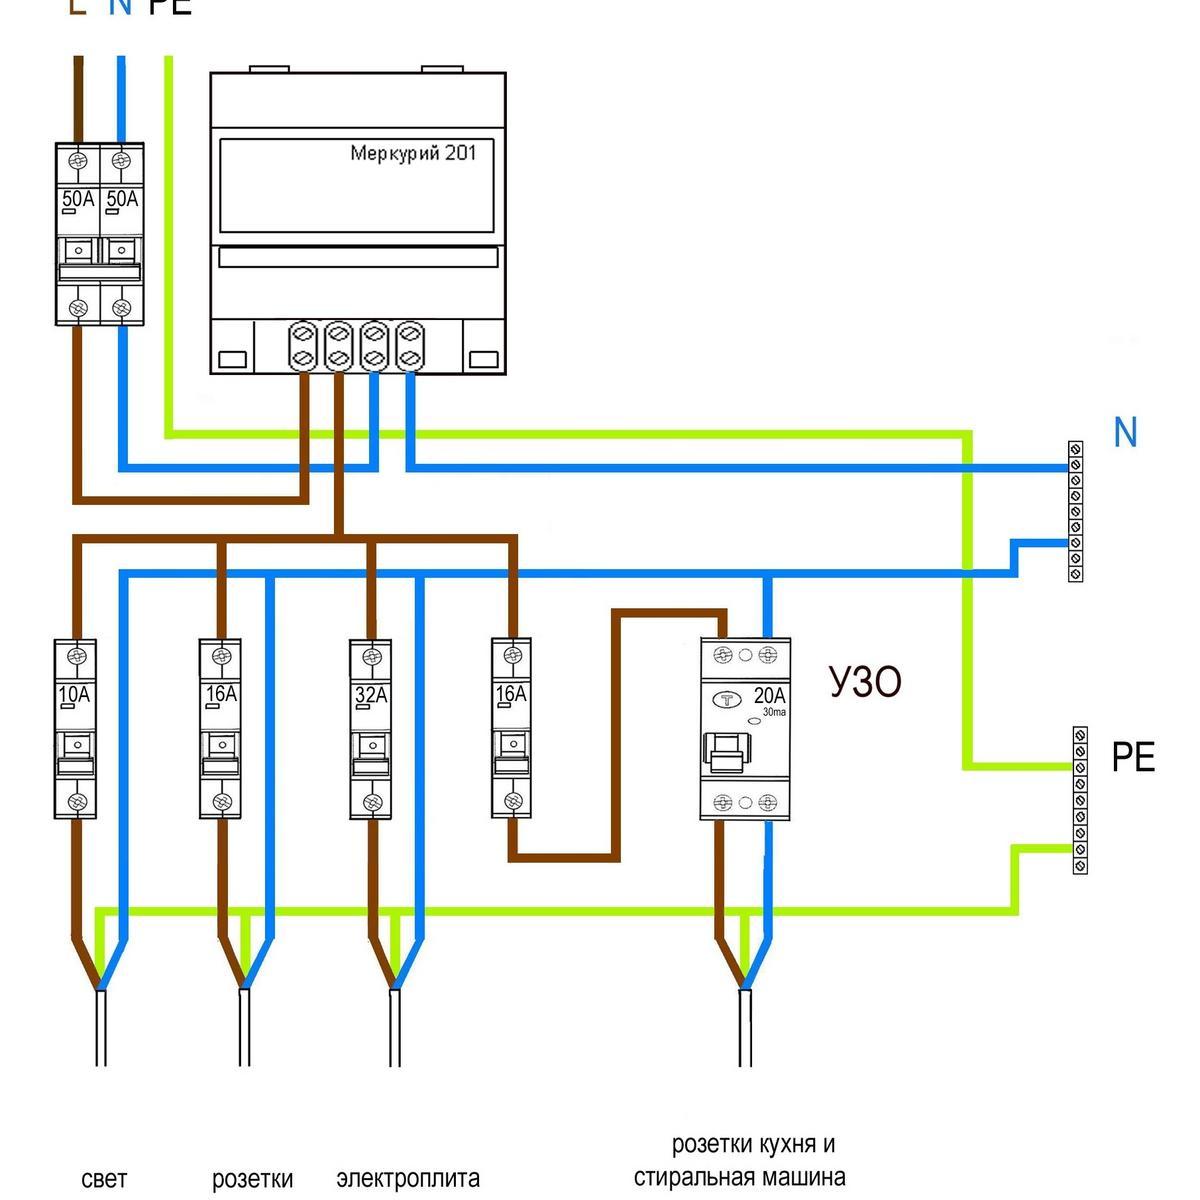 Схема подключения электросчетчика 90